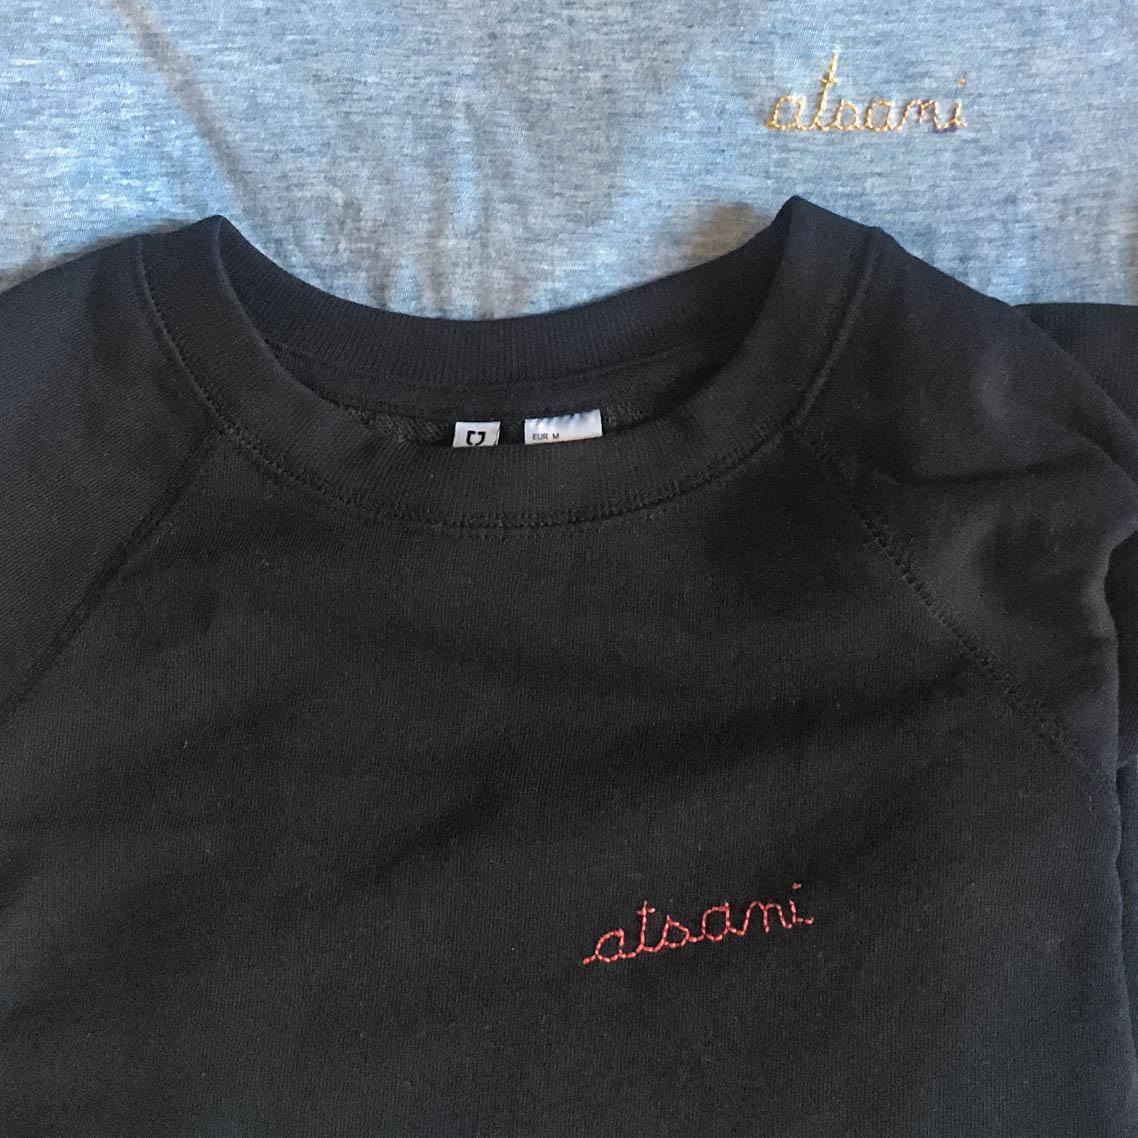 floe_shirt